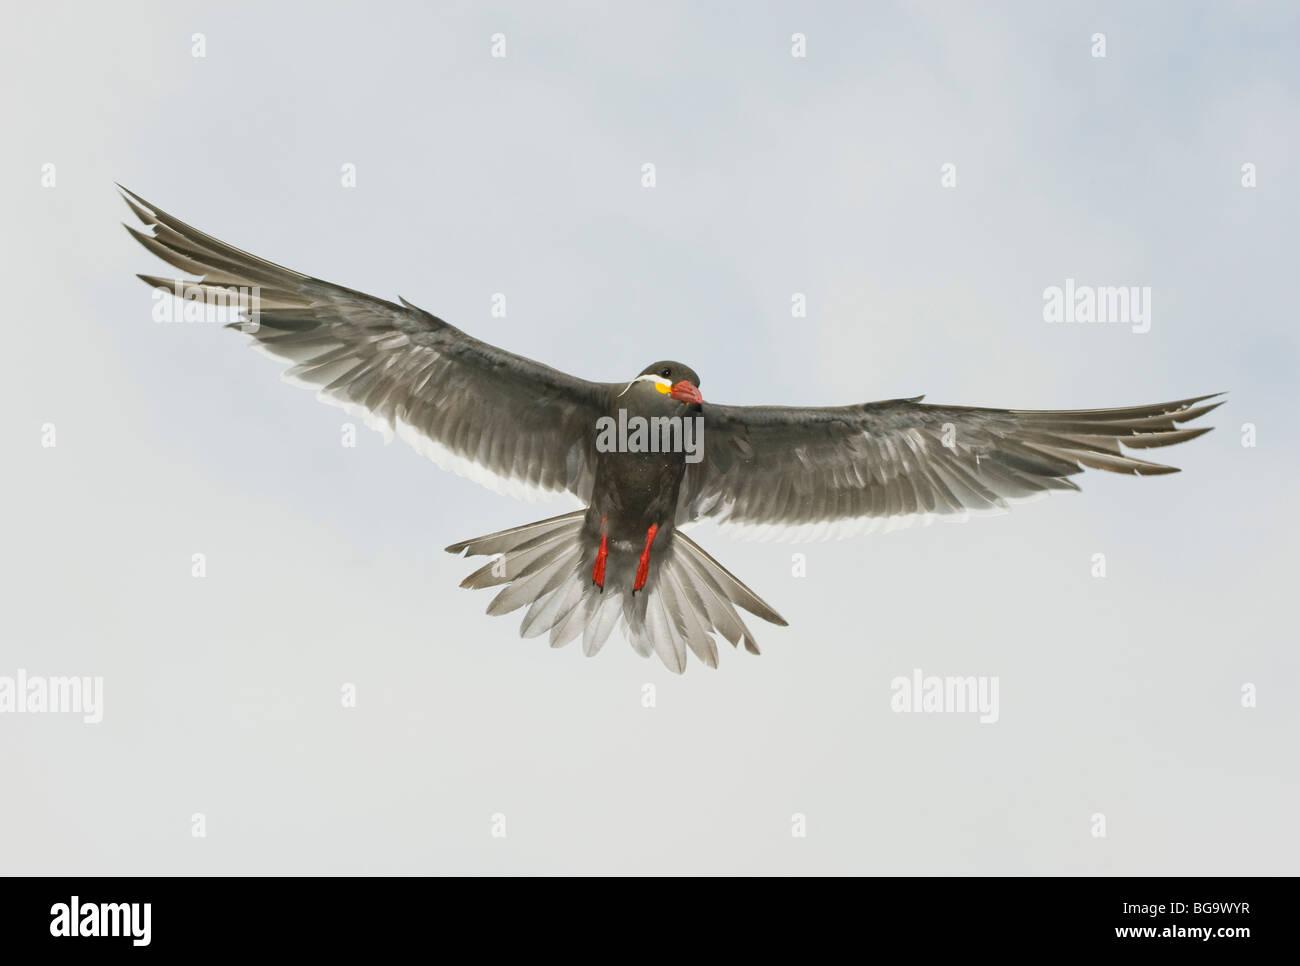 Inca Tern (Larosterna inca) In Flight, Pucusana, PERU Stock Photo